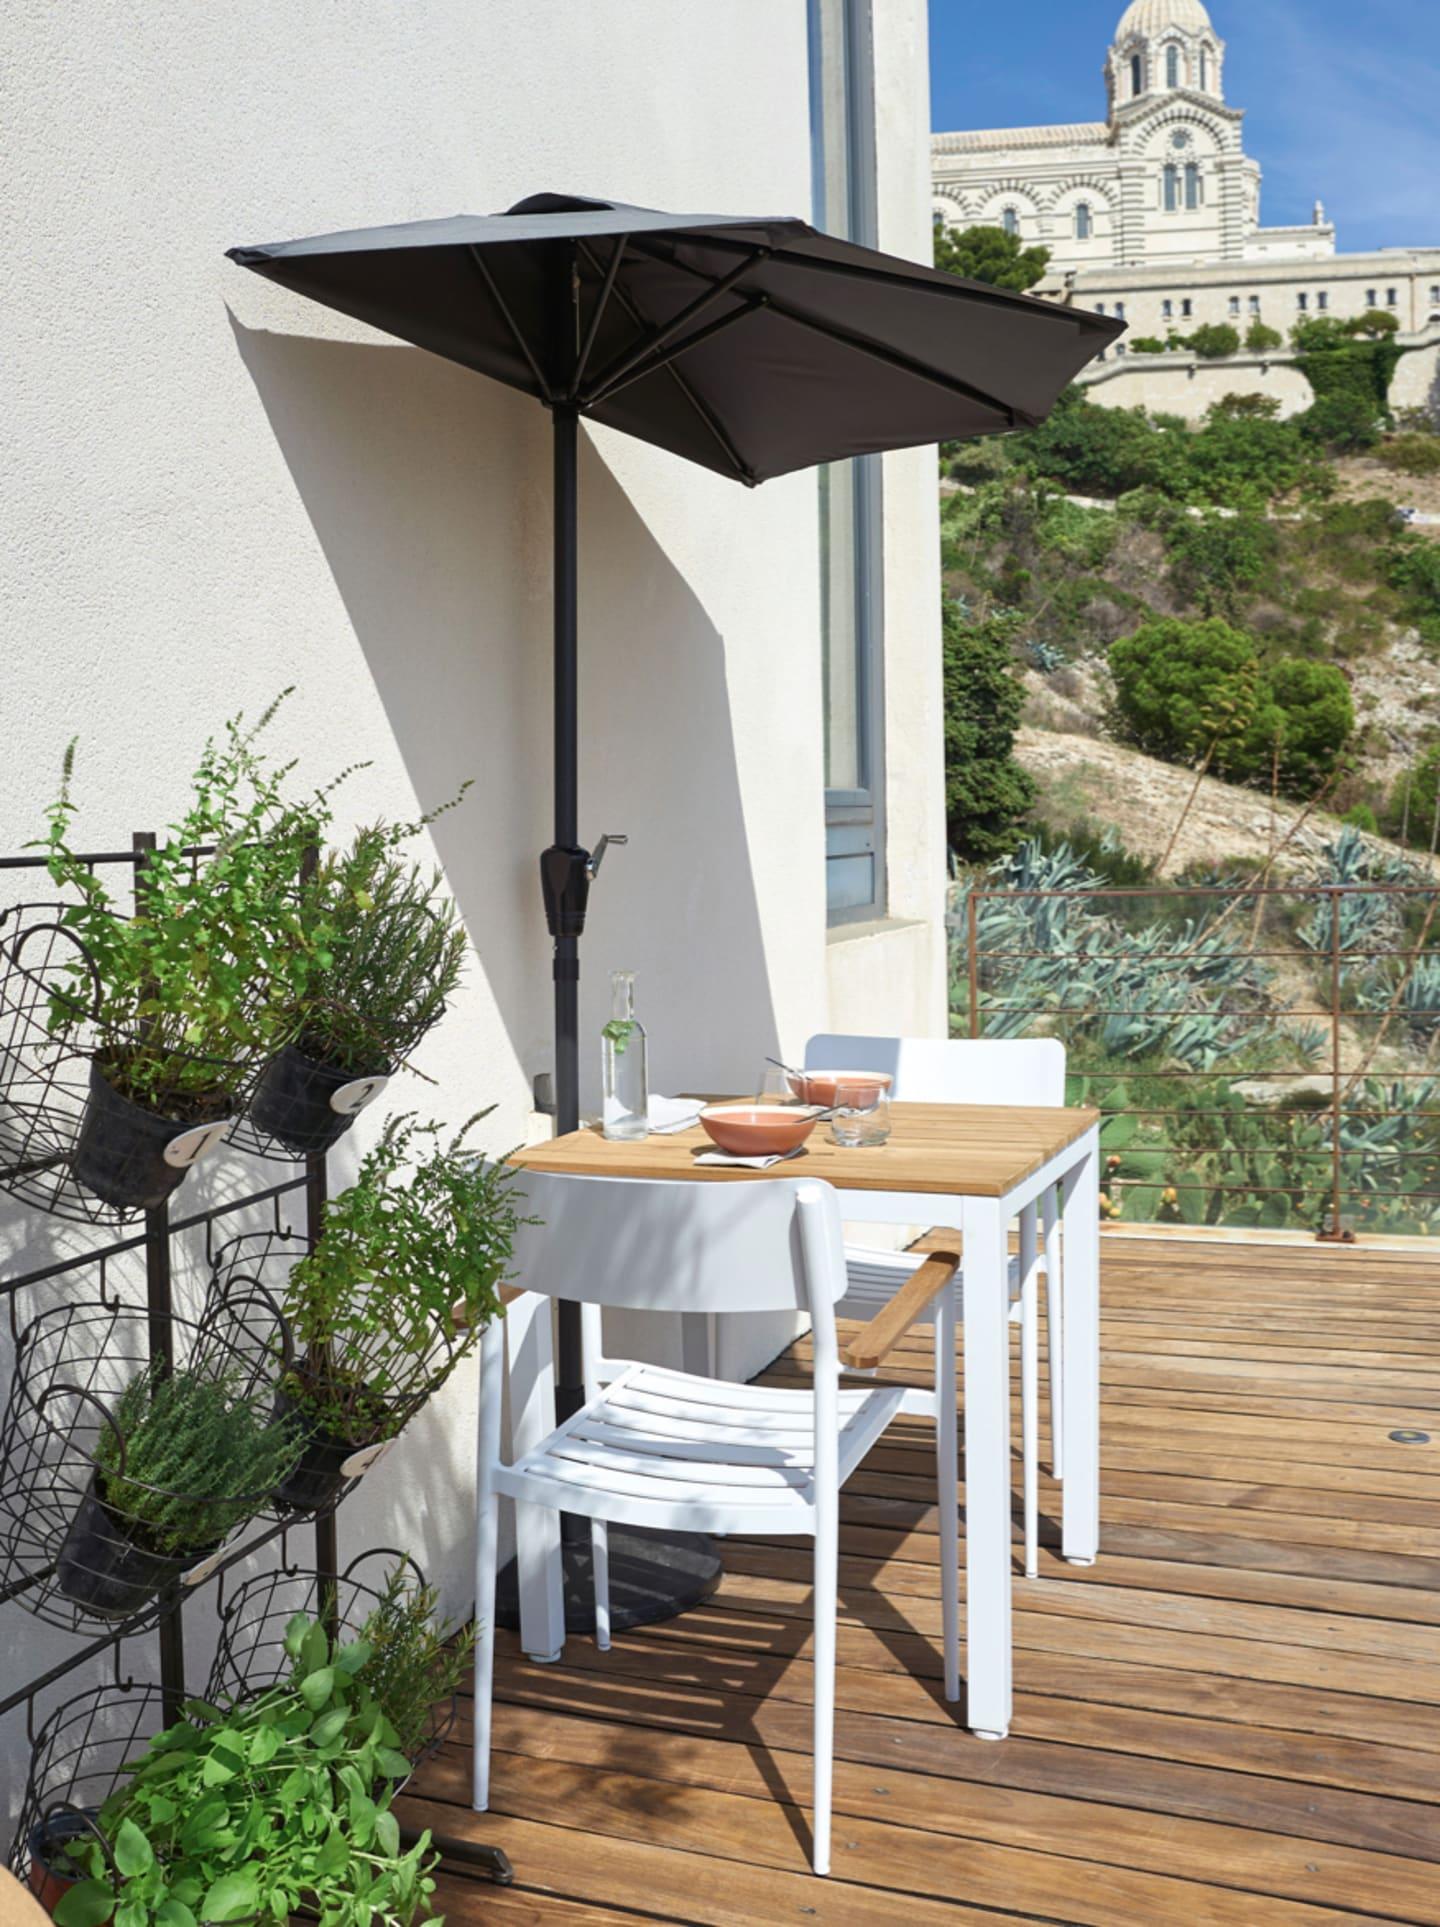 Garteneinrichtung Outdoor Sitzgruppen Garten Deko Maisons Du Monde